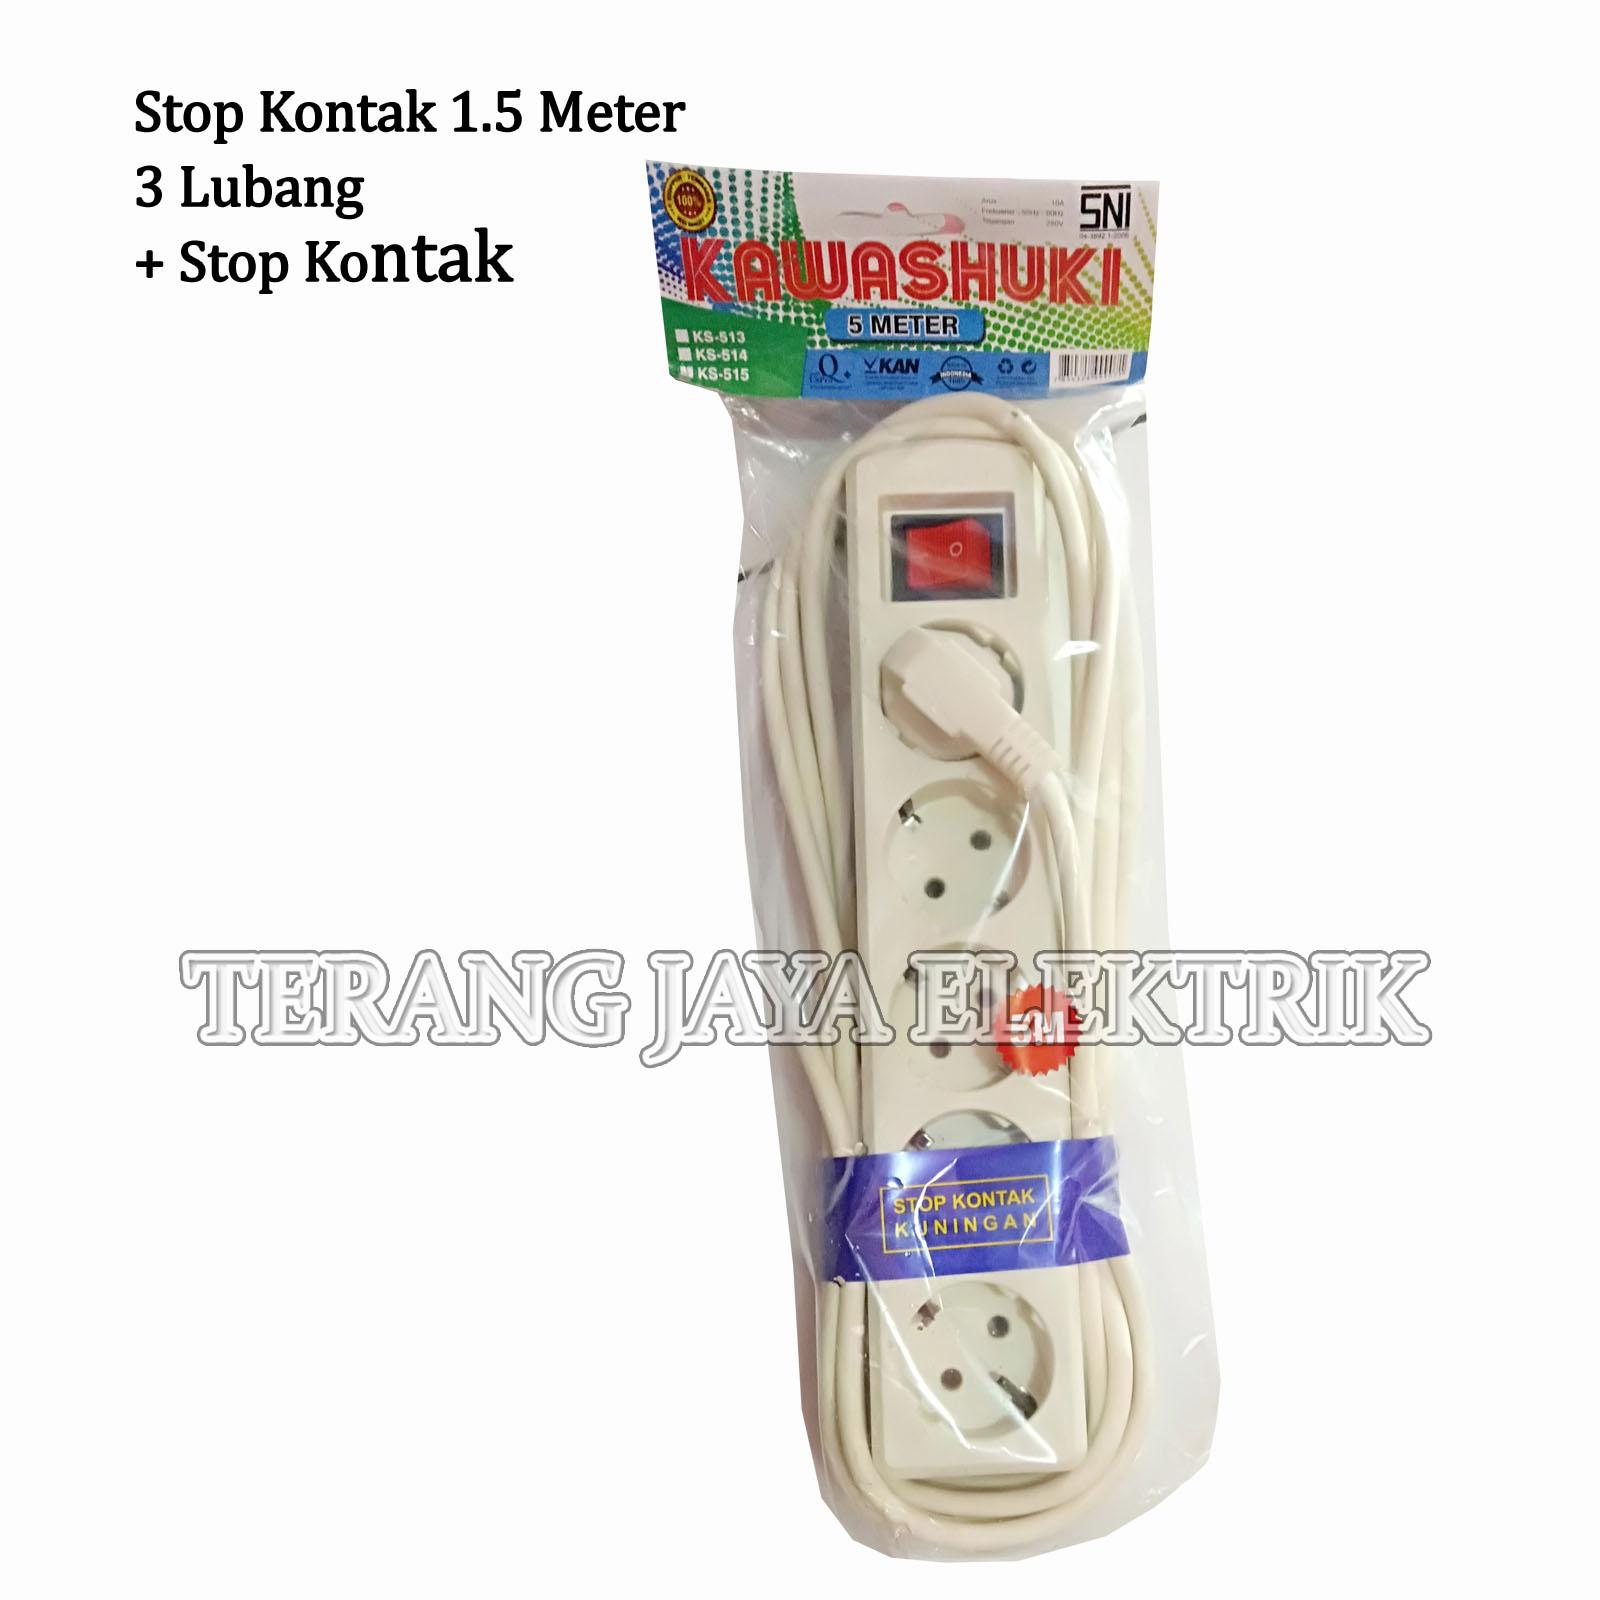 Detail Gambar Stop Kontak/Colokan Listrik 5 Meter 5 Lubang + Switch KAWASHUKI Terbaru